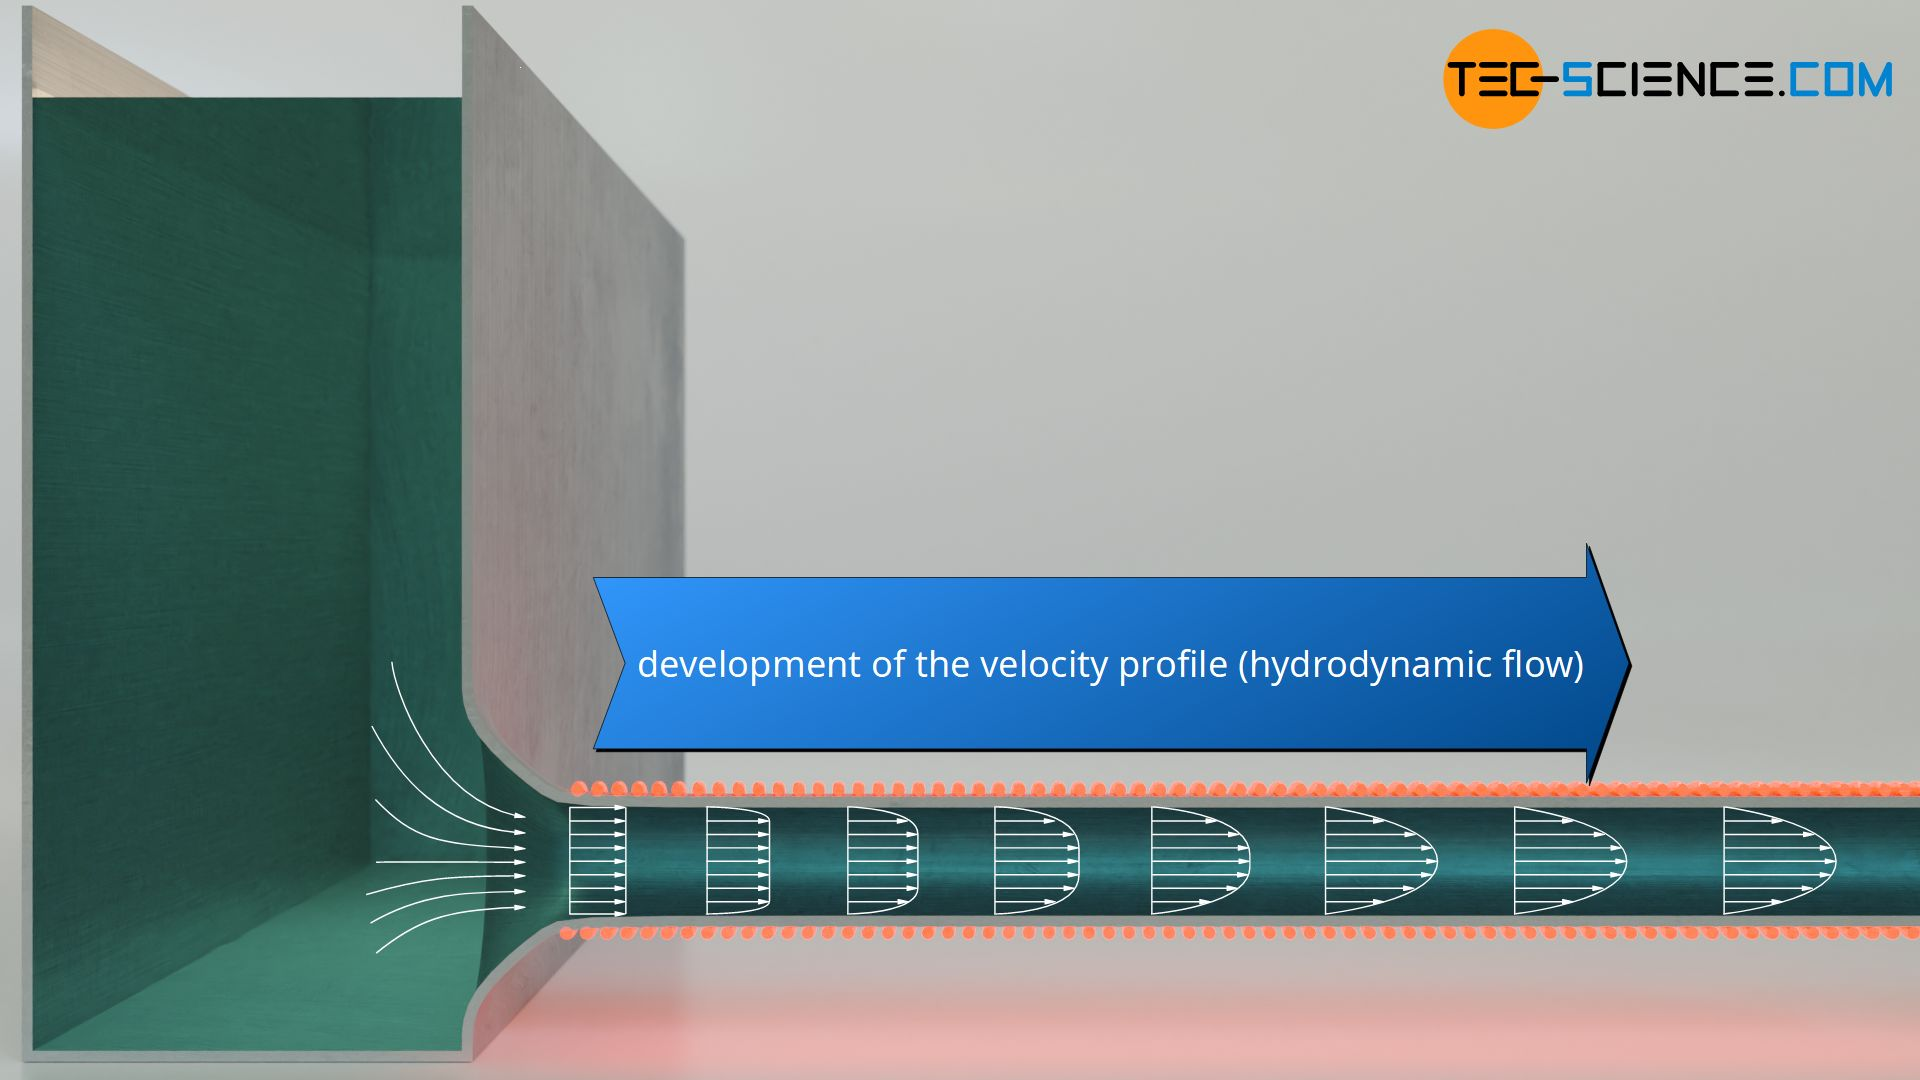 Development of the velocity profile (hydrodynamic flow profile)